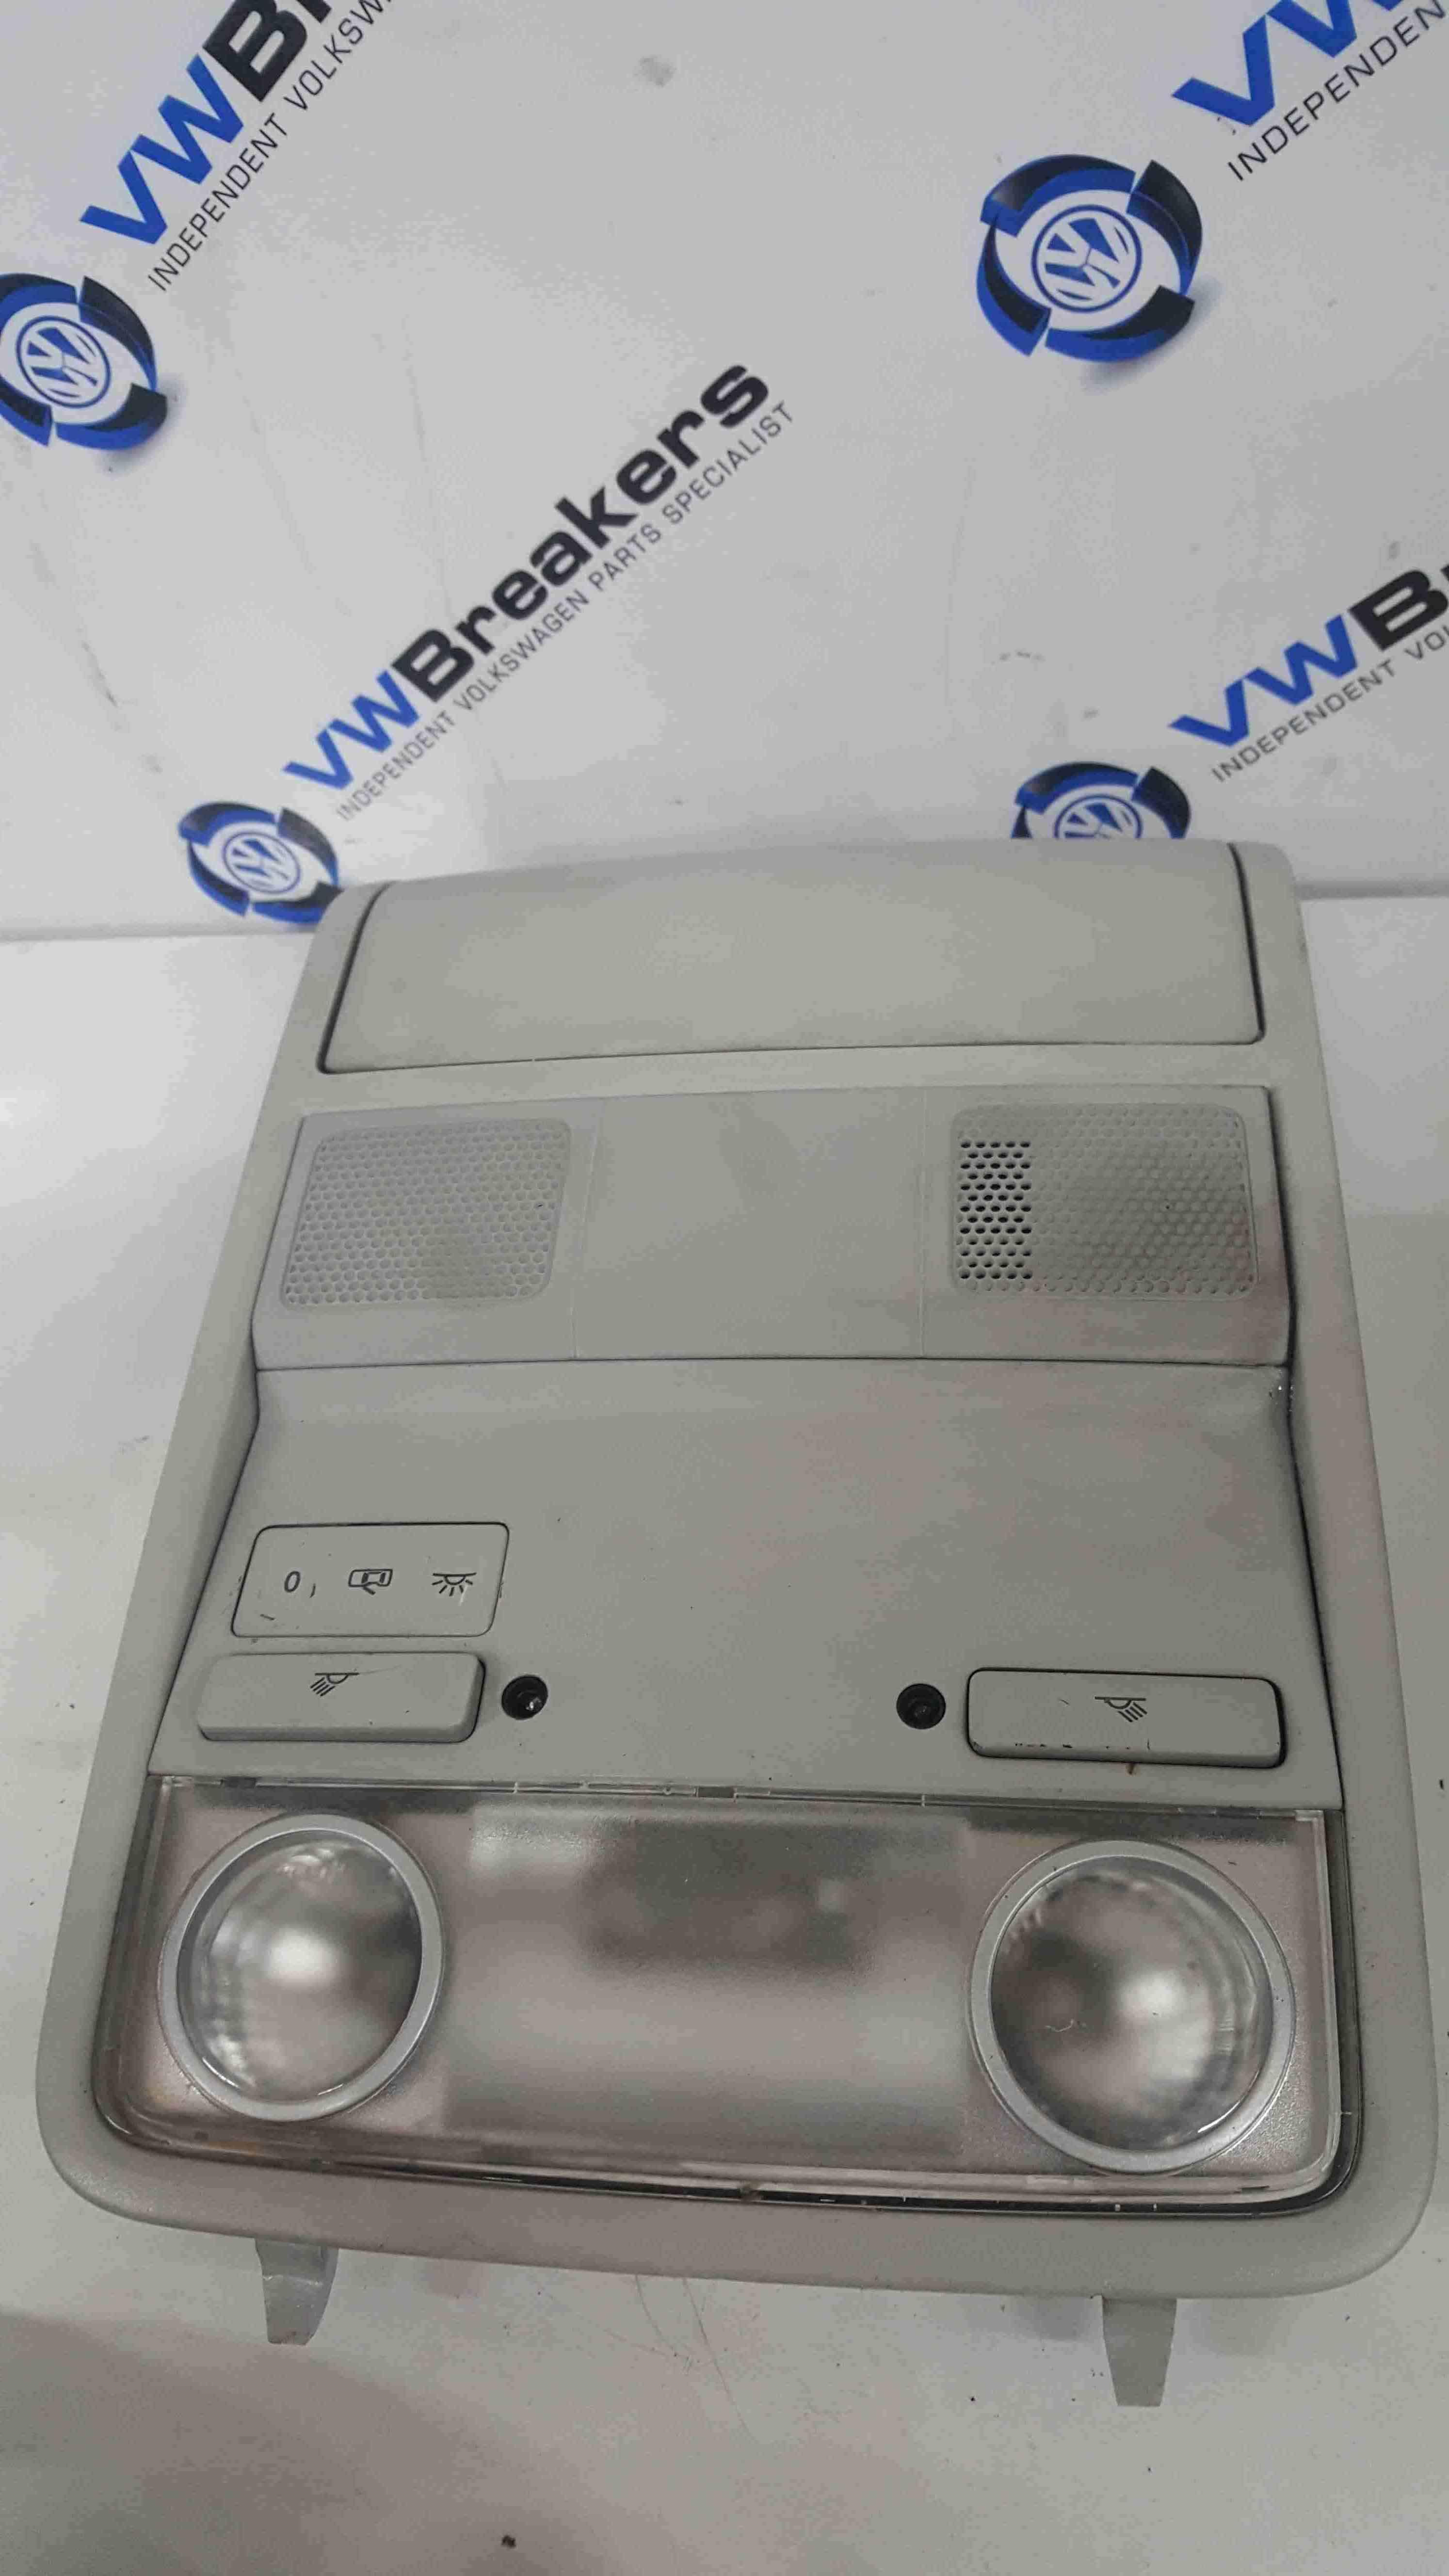 Volkswagen Passat B6 2005-2010 Interior Light Panel Compartment 1K0868837